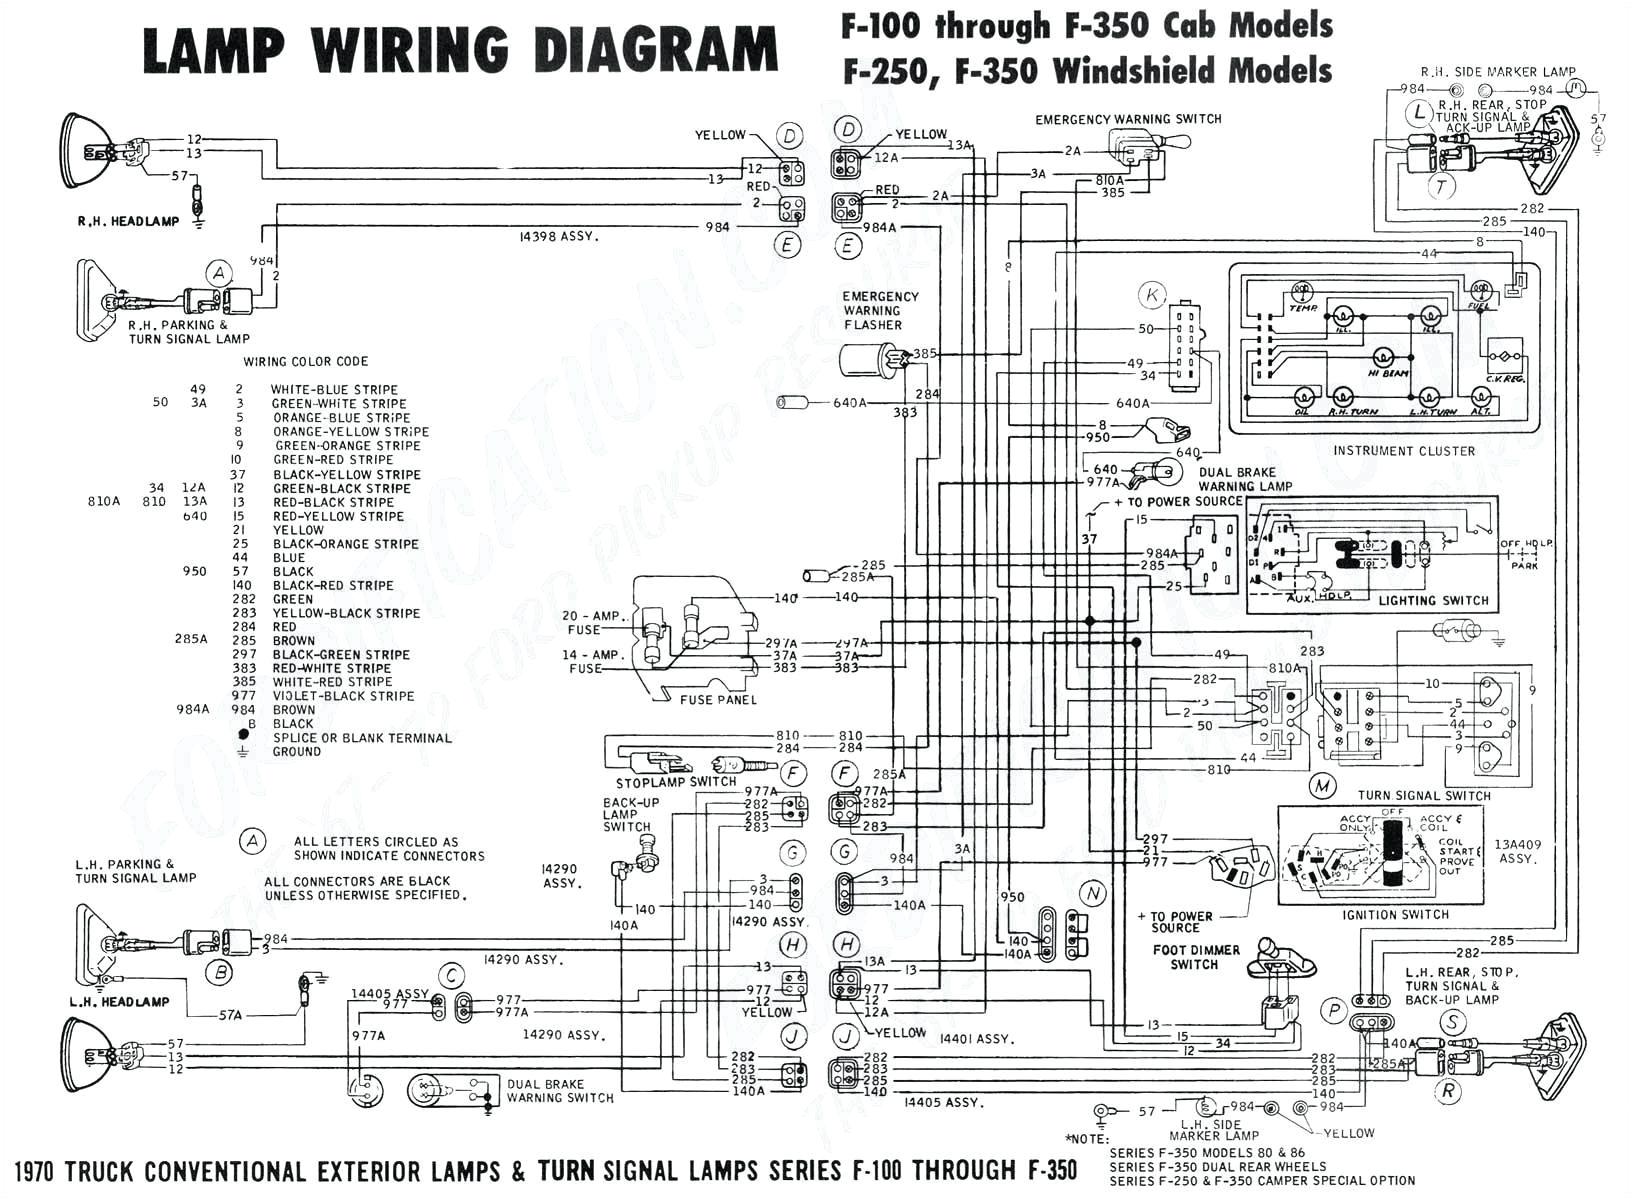 57 chevy pickup wiring diagram wiring diagram technic57 chevy 210 heater wiring data diagram schematicwiring diagram